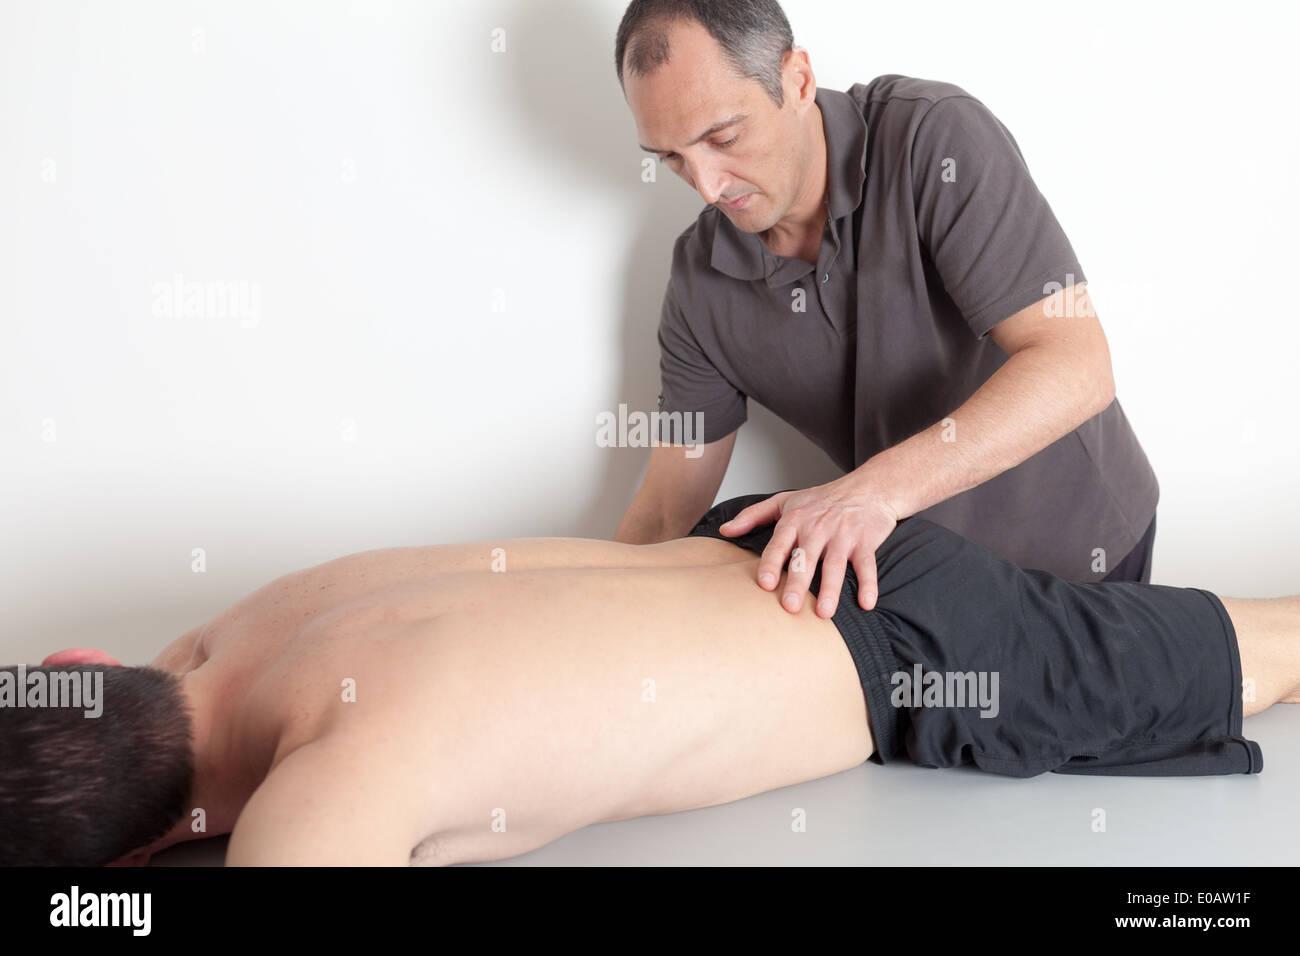 pelvis manipulation - Stock Image